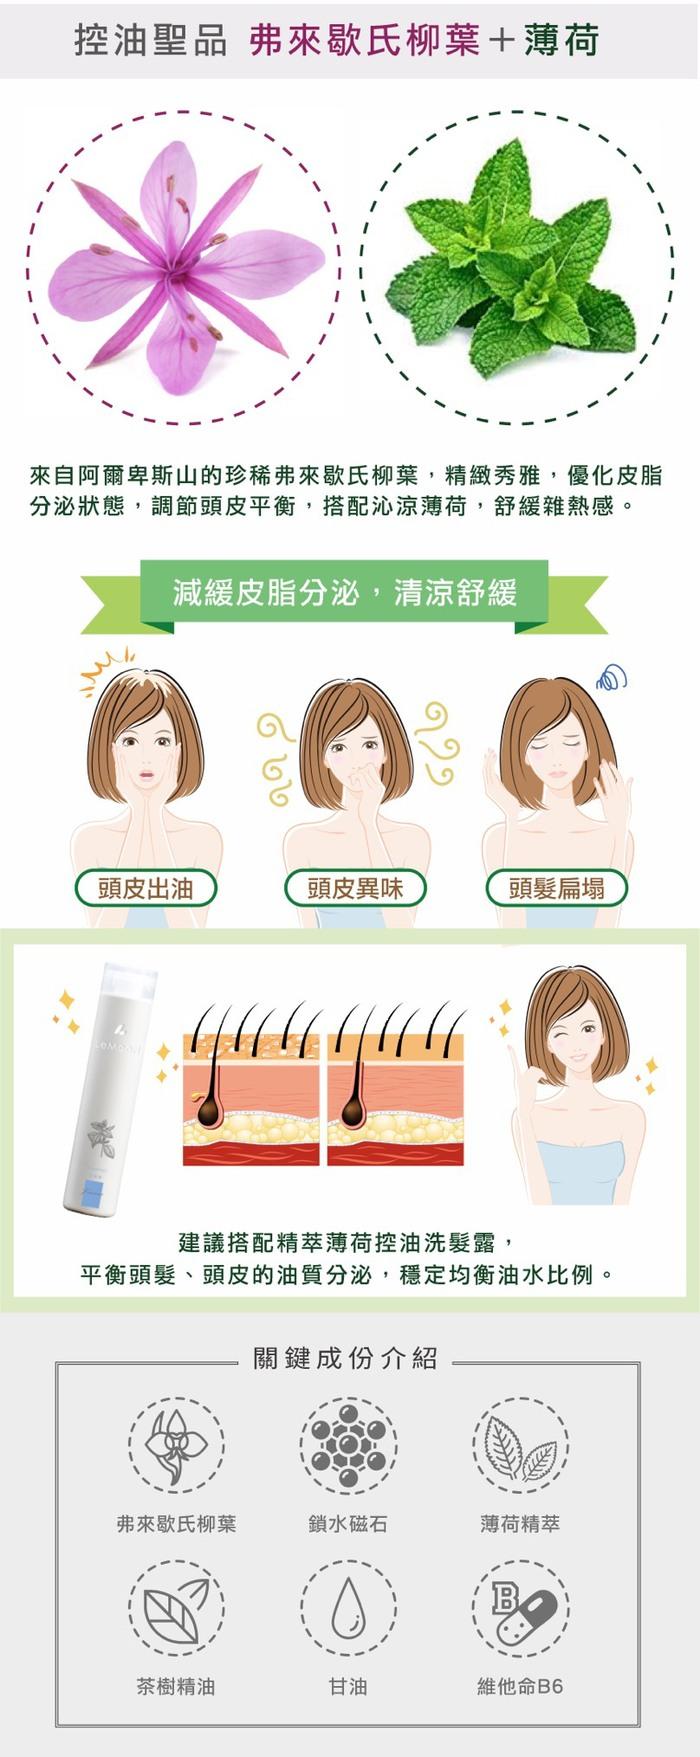 【LeMood】不油自主 茶樹控油精華液 (頭皮滋養與養護)-50ml